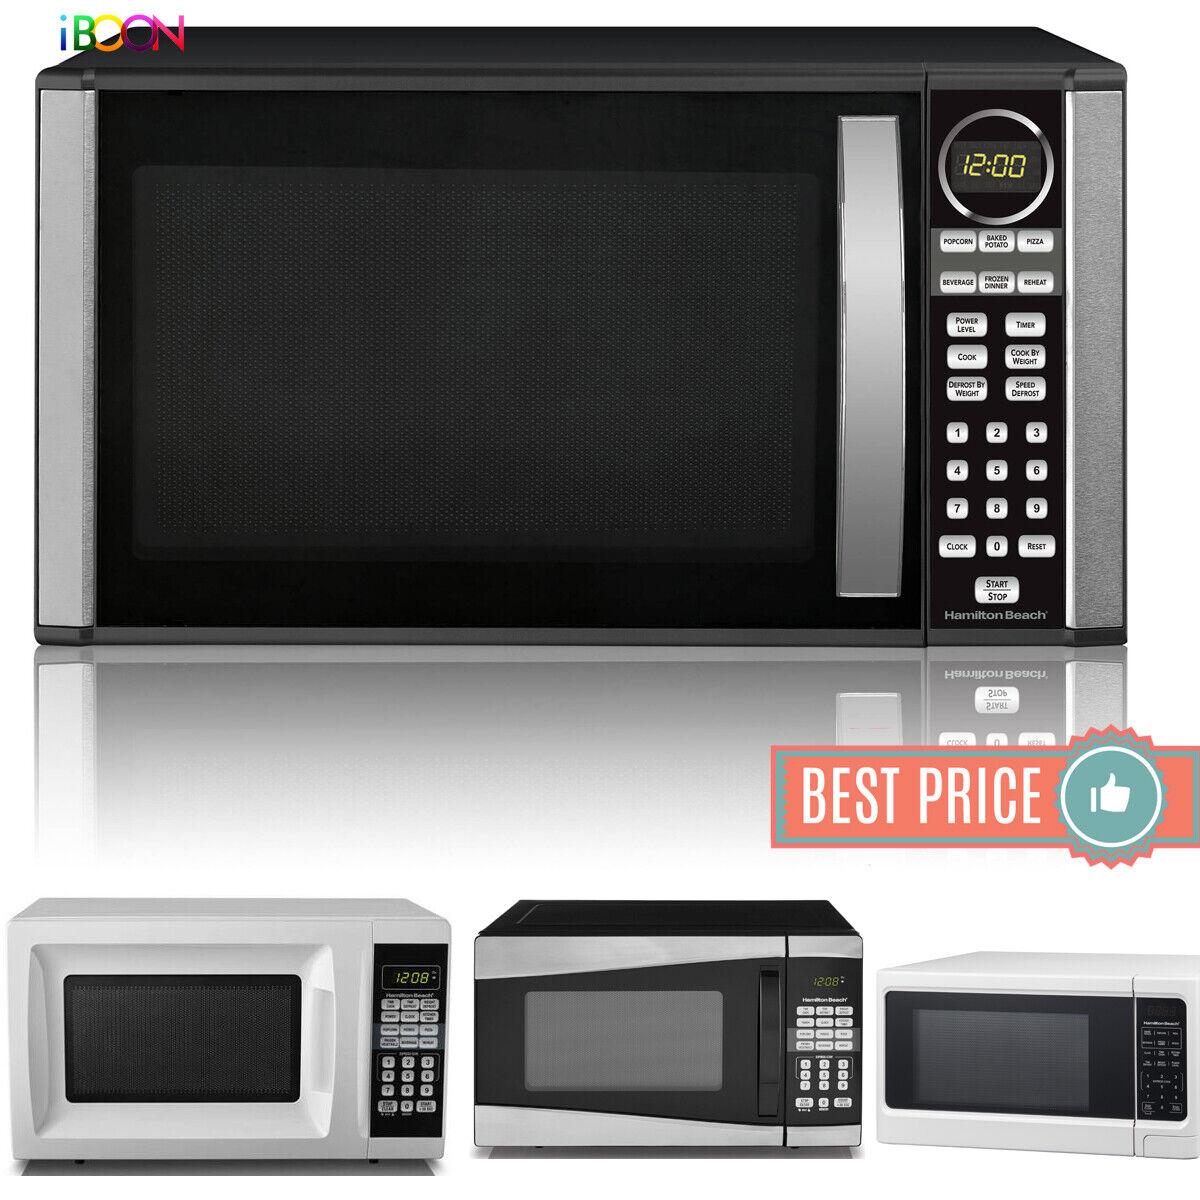 hamiltonbeach microwave convection oven countertop digital s